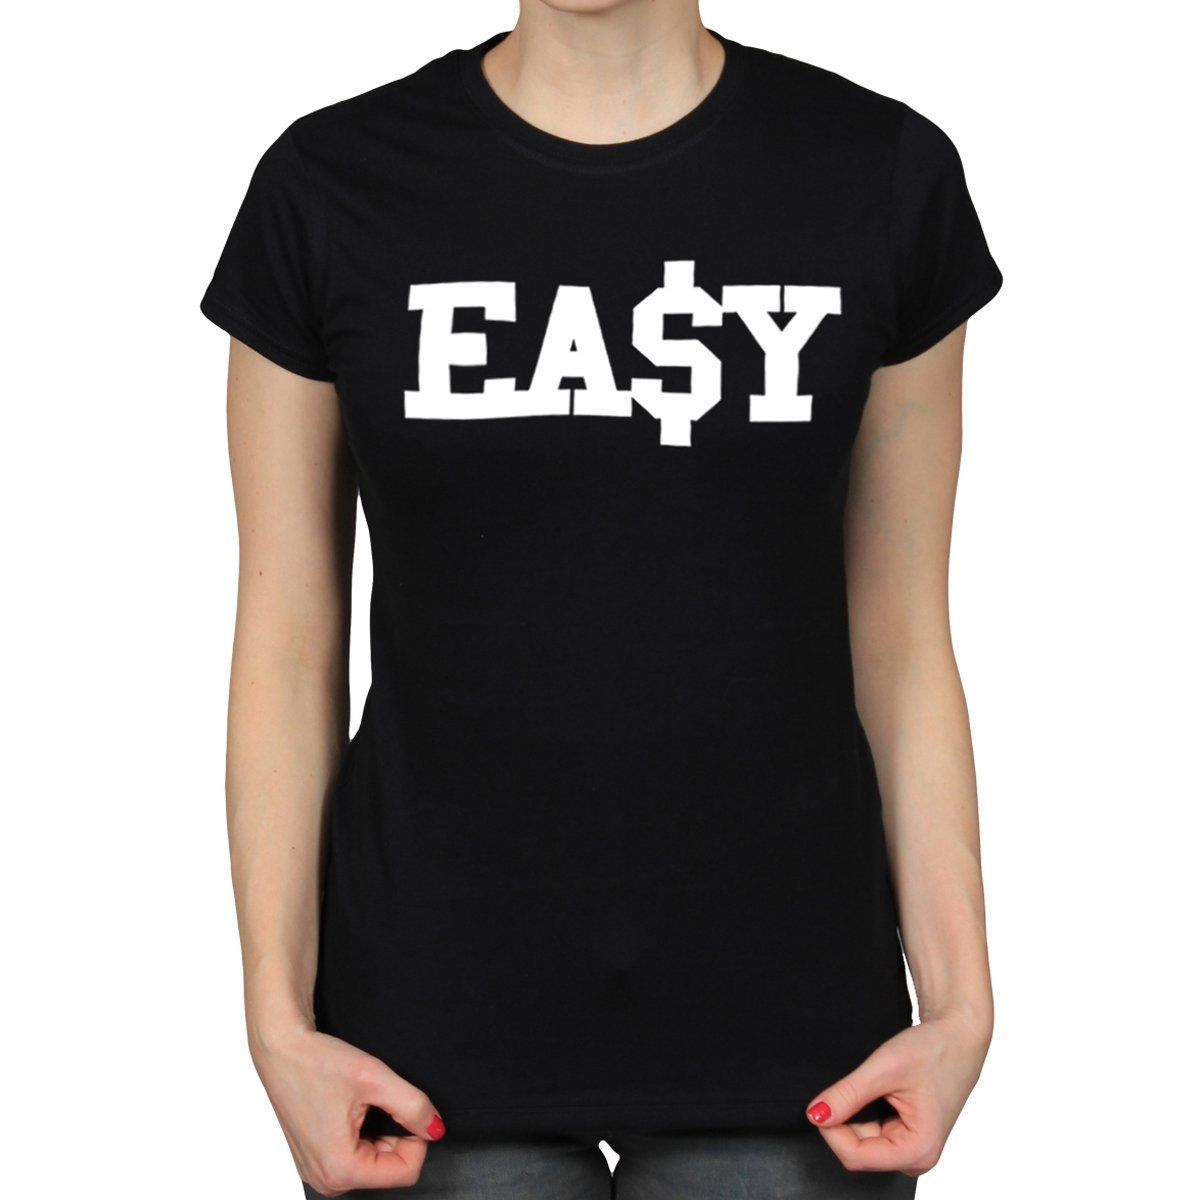 Easy dollar college swag urban rap hip hop ladies black t shirt girls tee 331 ebay